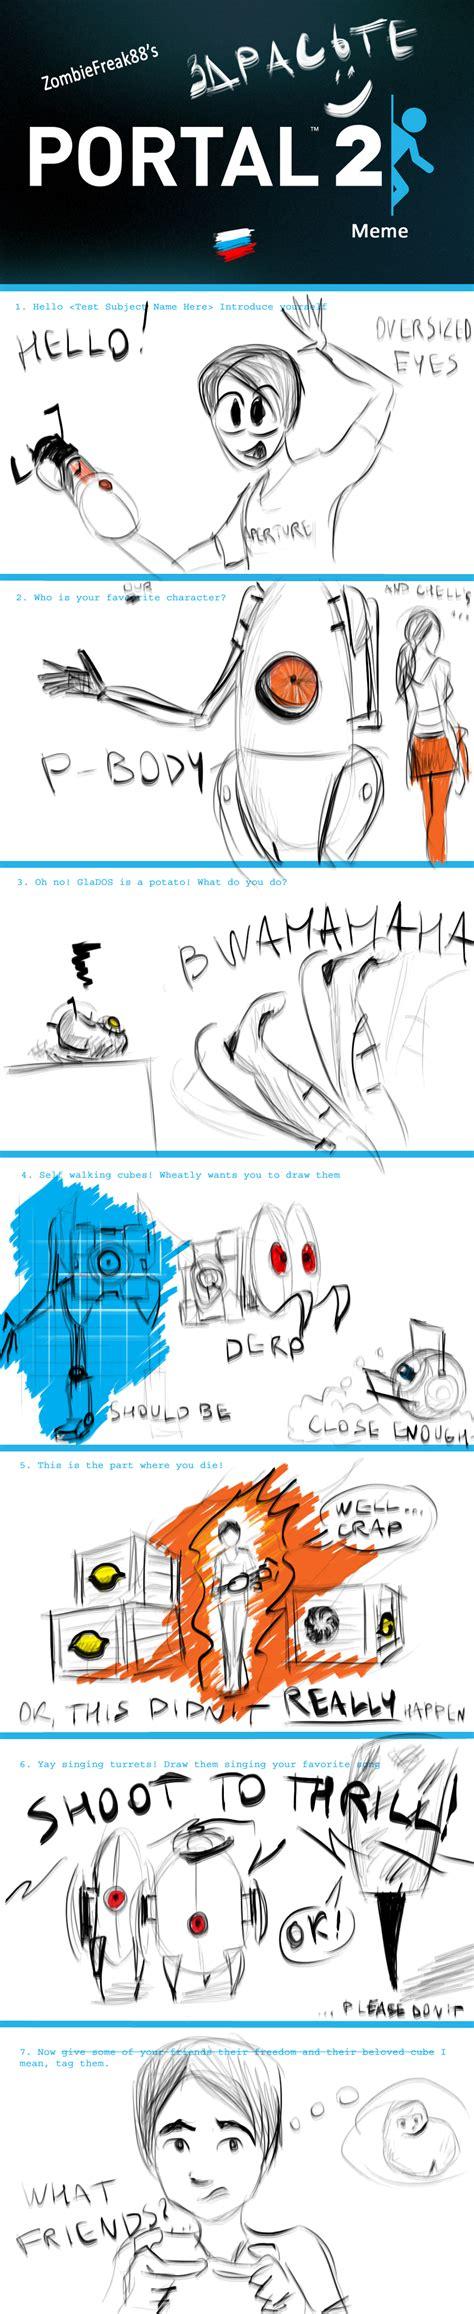 Portal Memes - portal 2 meme by iproton on deviantart